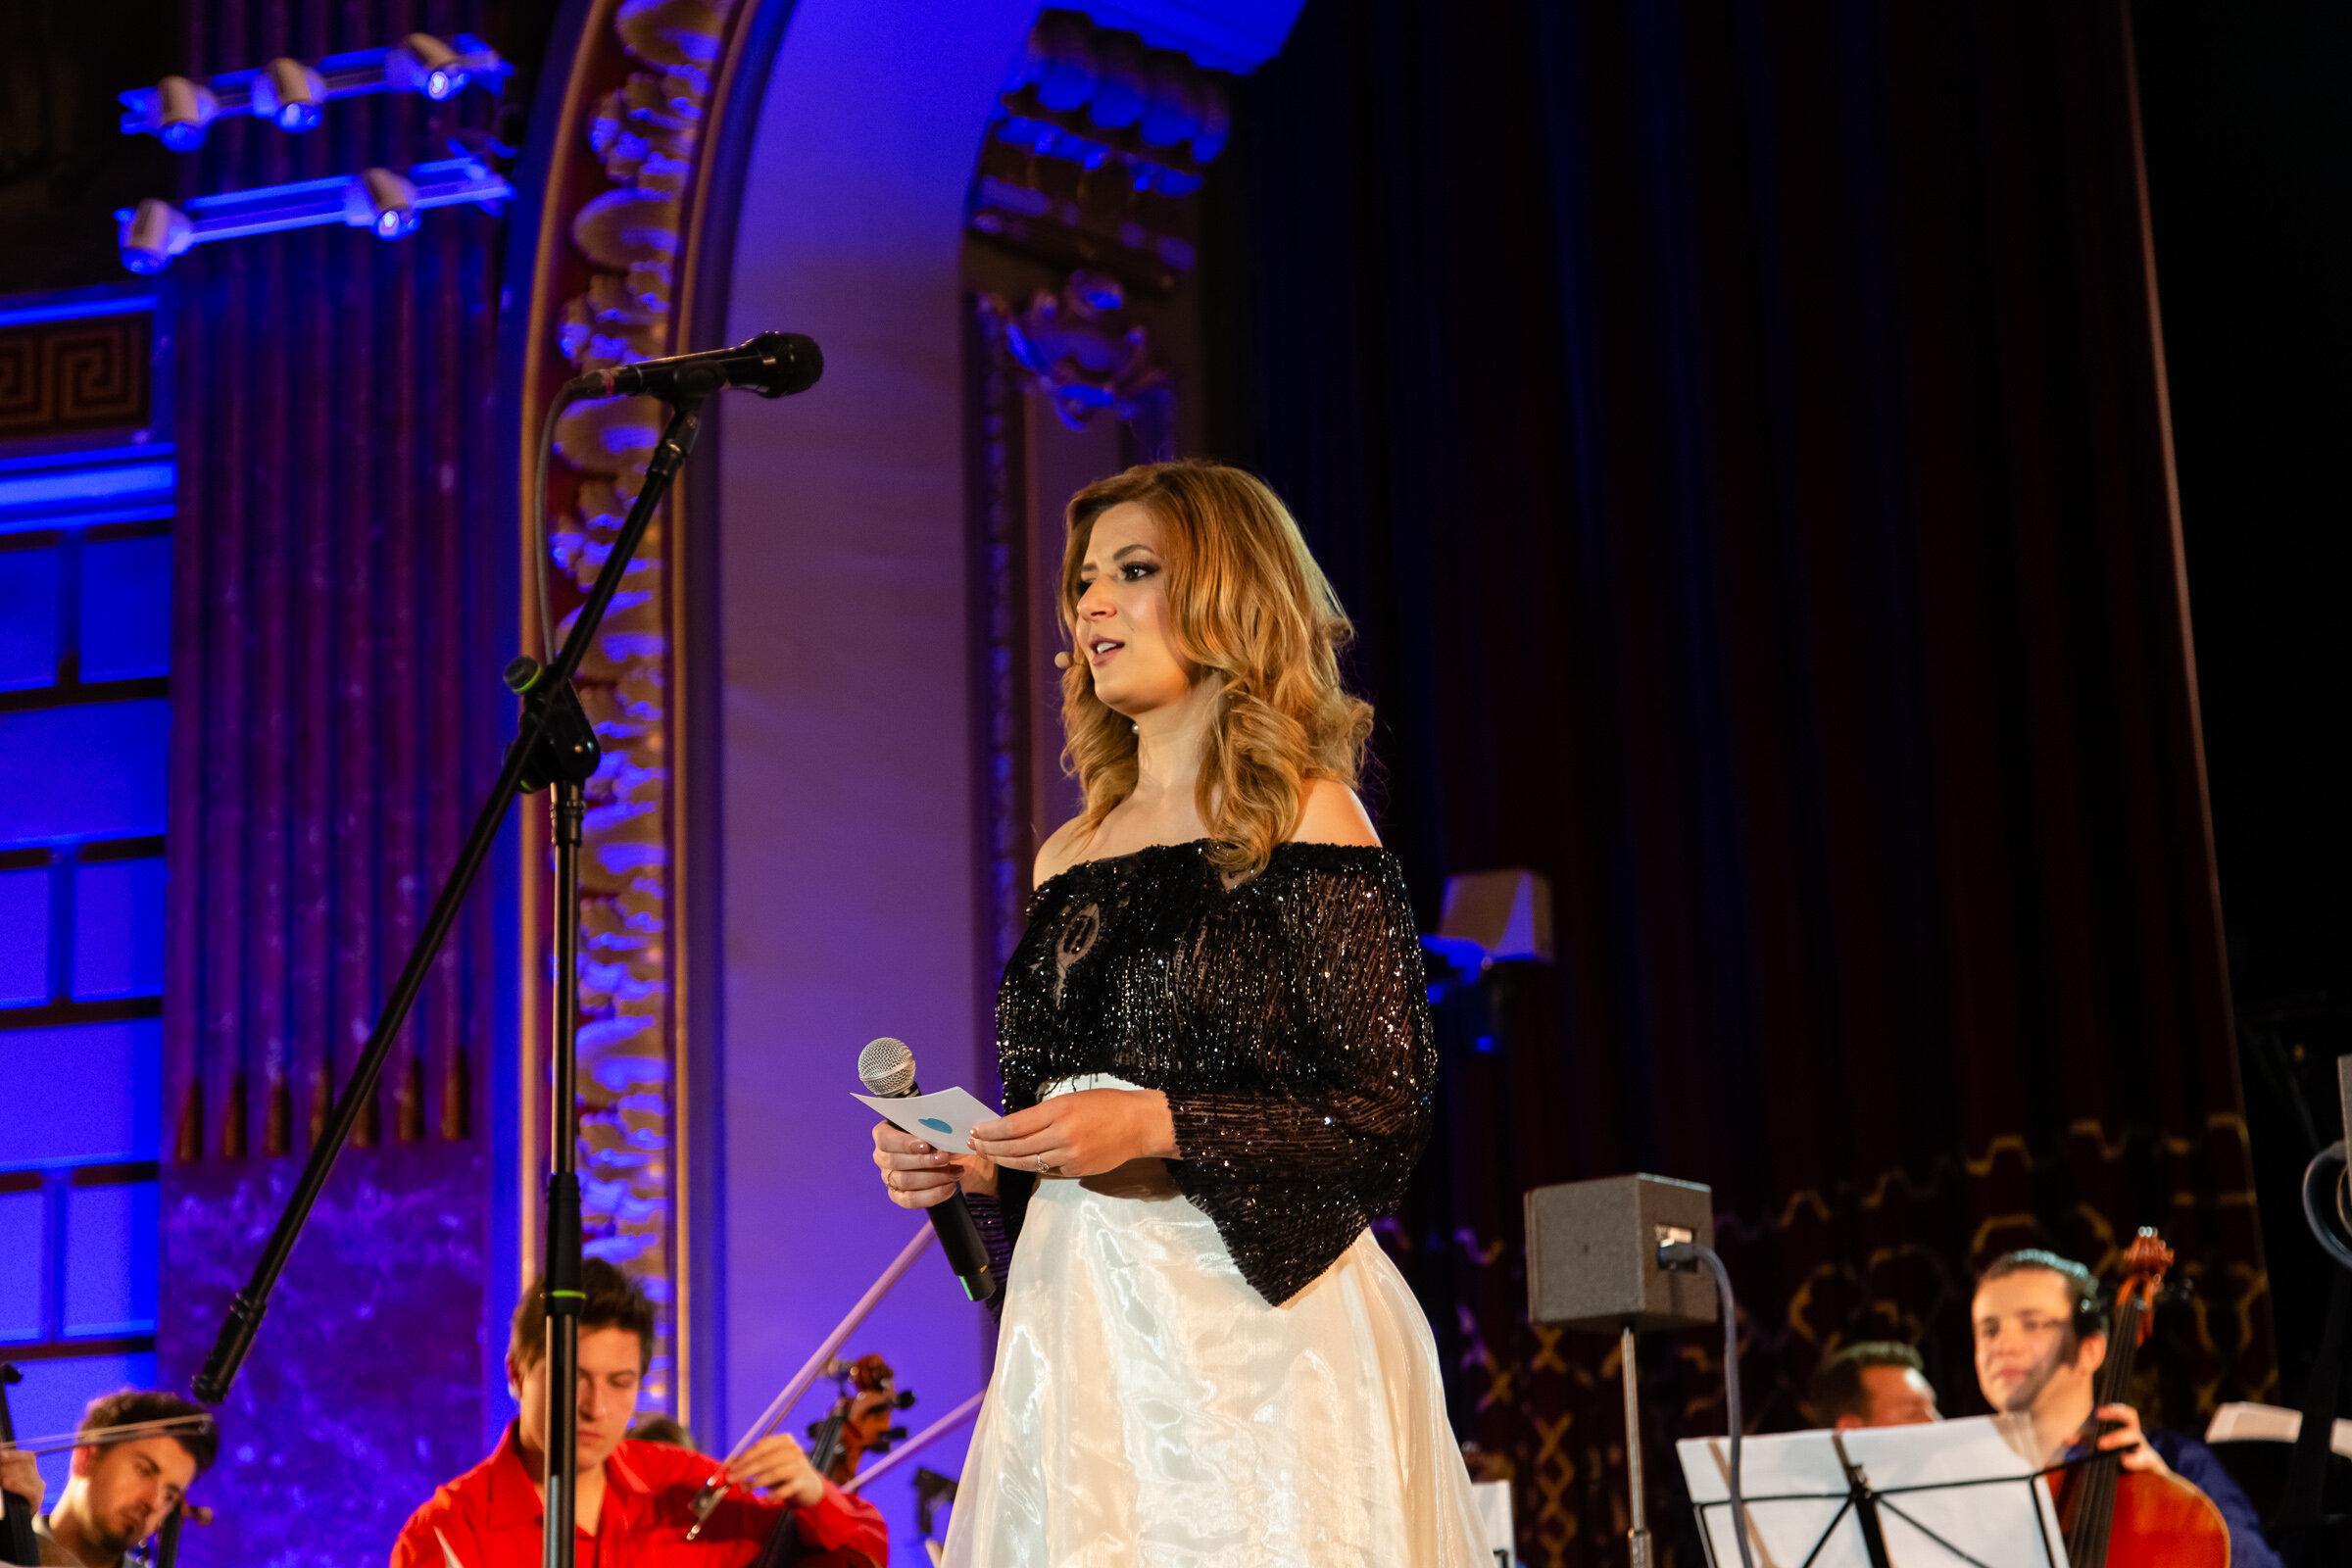 Amalia Enachje_Hope Concert 2019_03_Foto Mihnea Ciulei.jpg